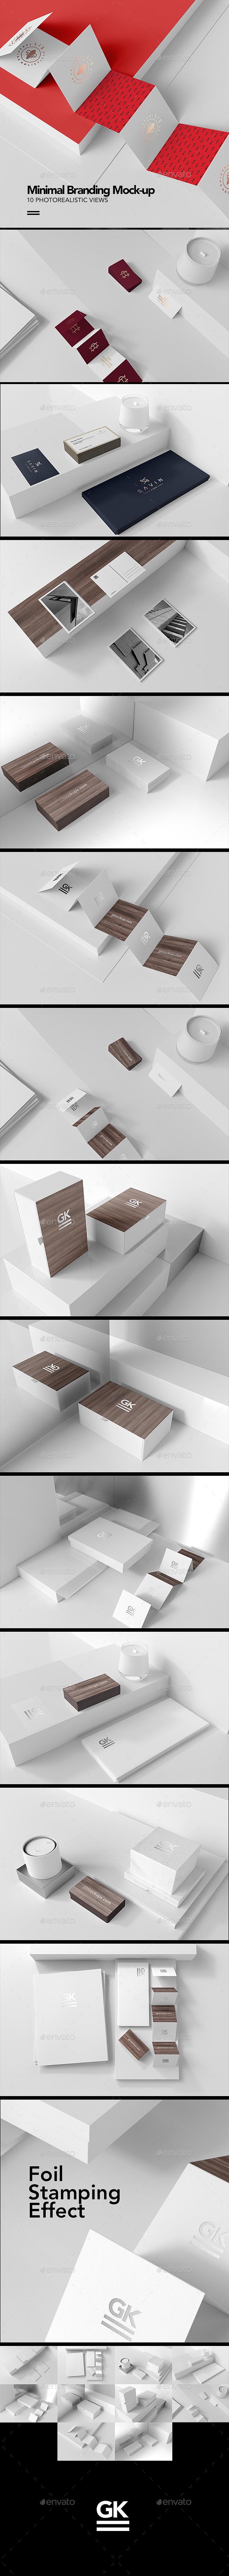 Minimal Branding / Stationary Mock-up - Stationery Print